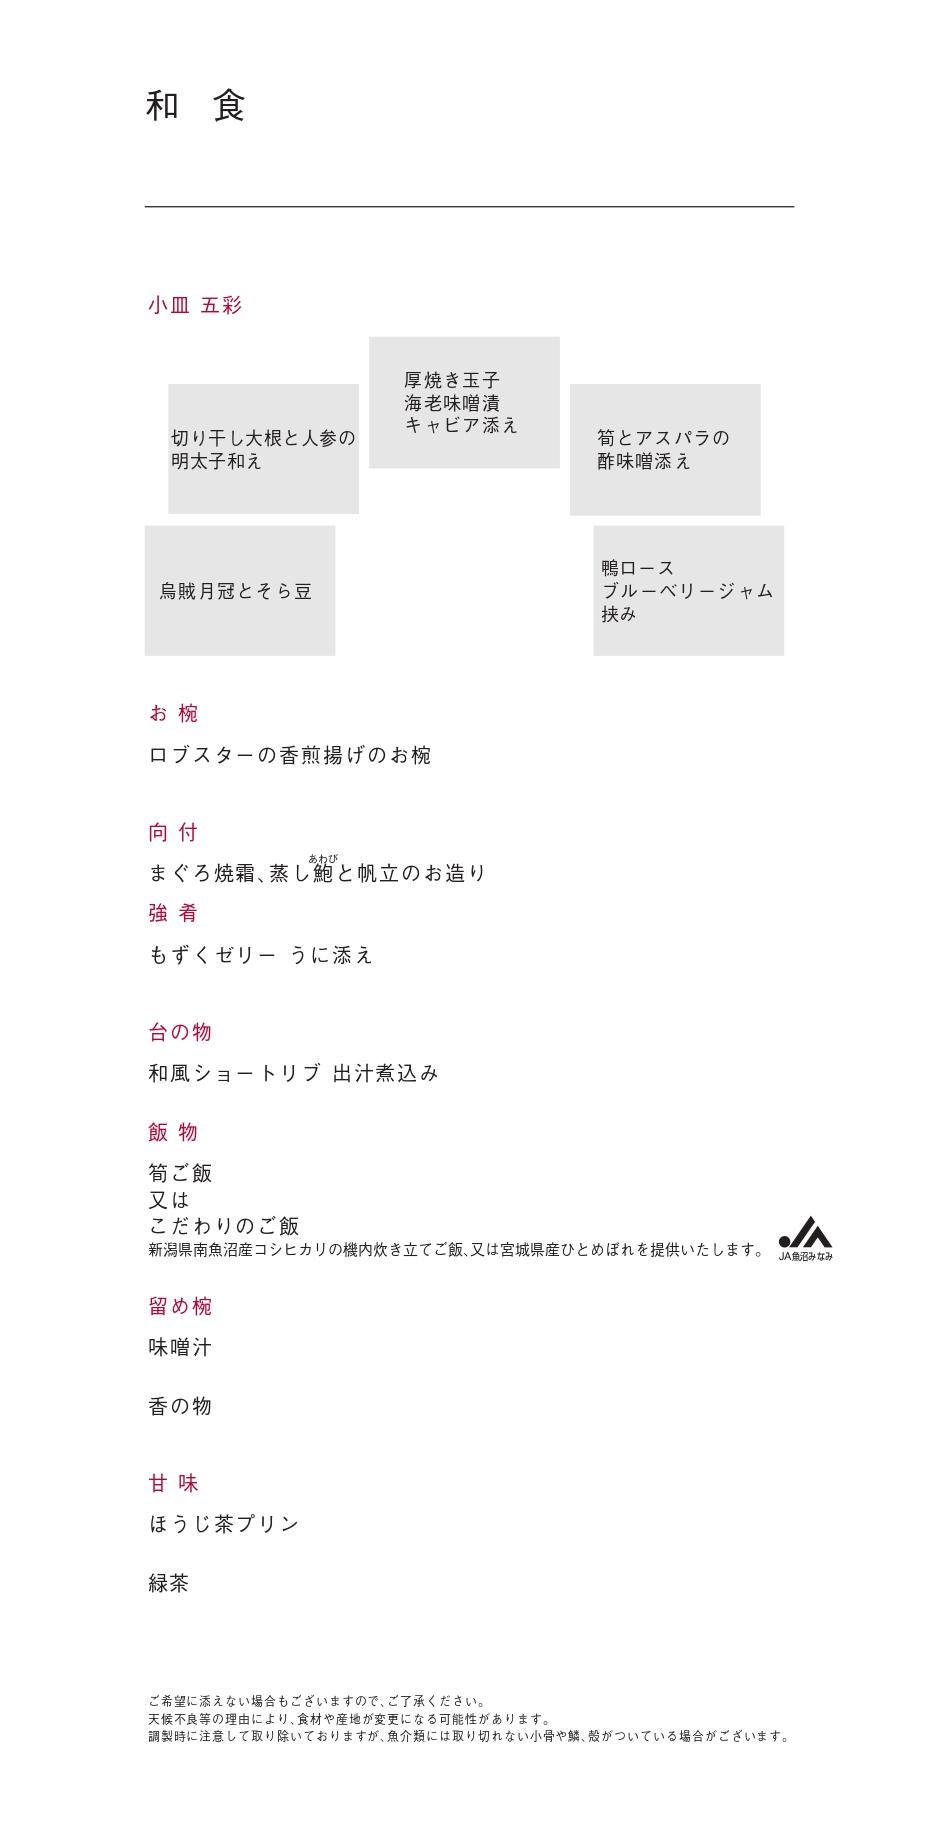 JL005 11MAR20 ニューヨーク~羽田 ファーストクラス